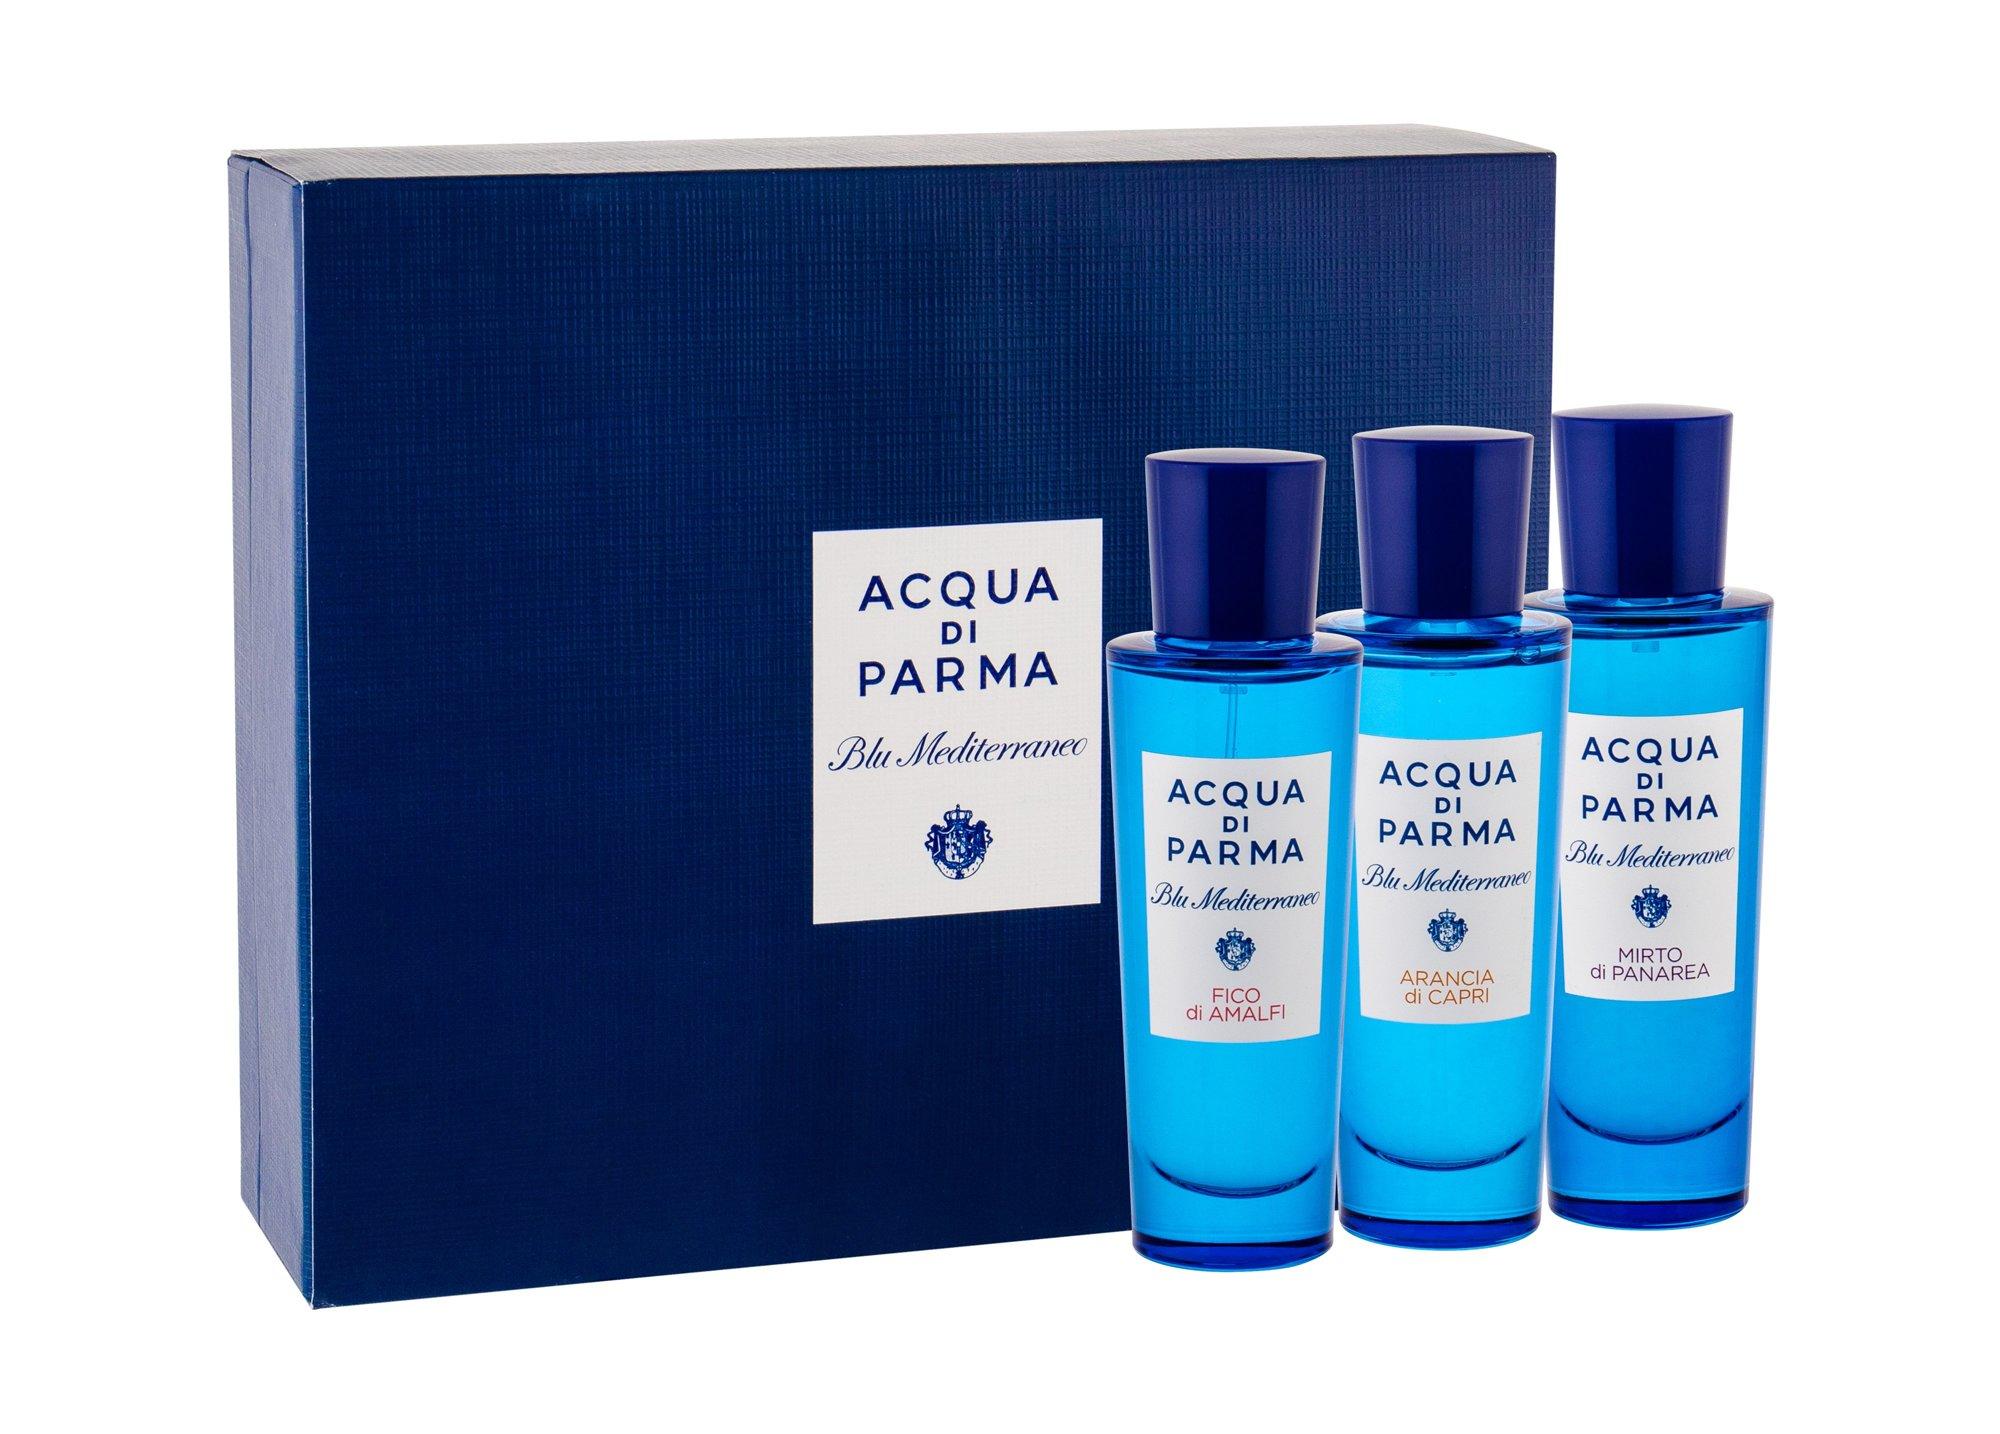 Acqua di Parma Blu Mediterraneo Eau de Toilette 3x30ml